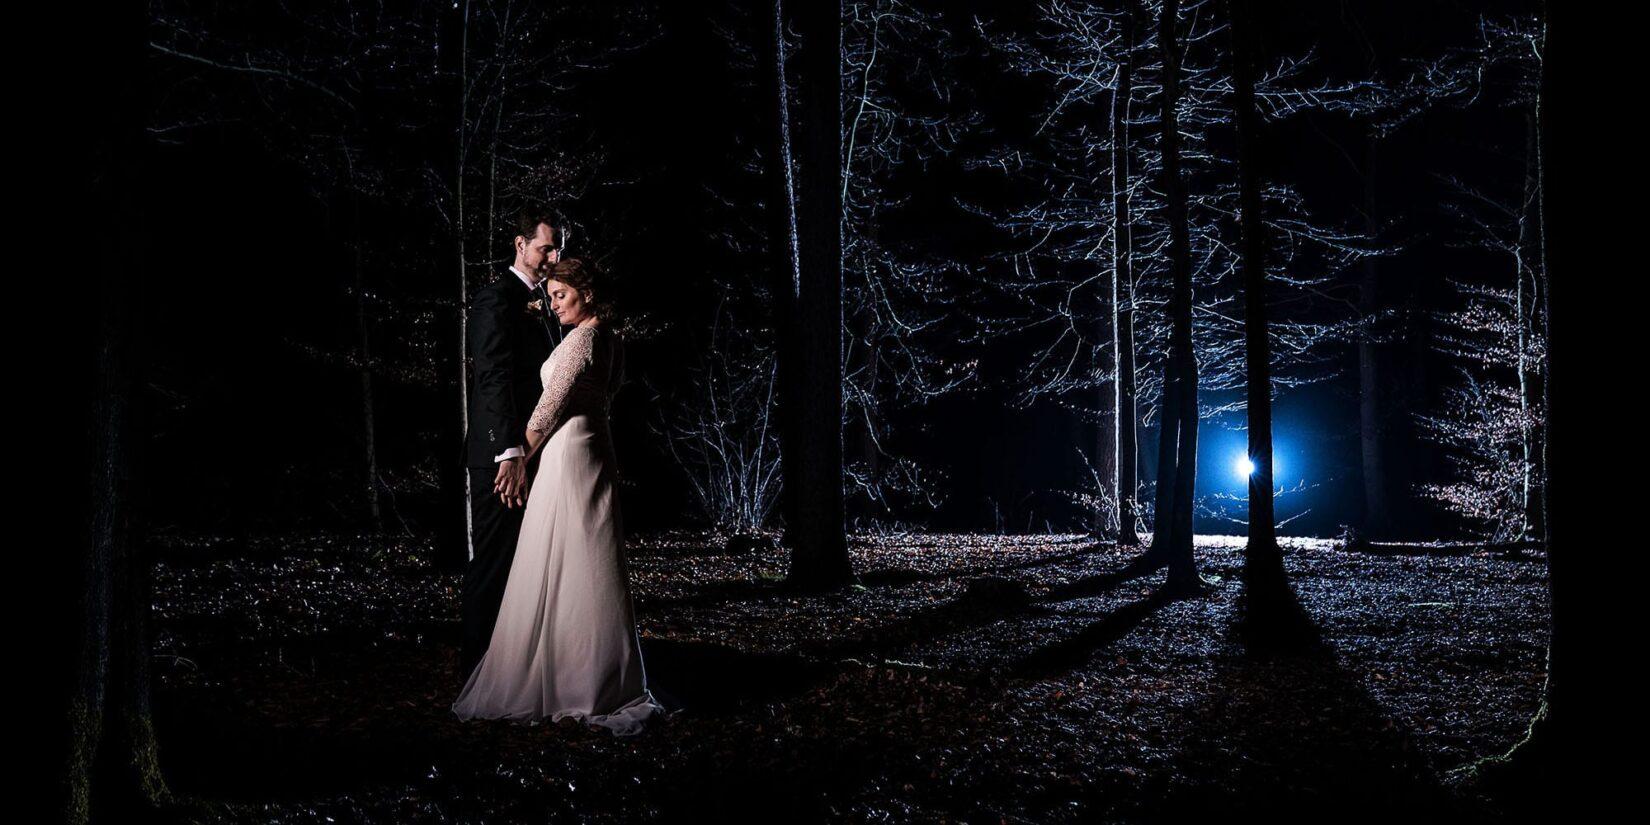 Romantisch bruidspaar in bos